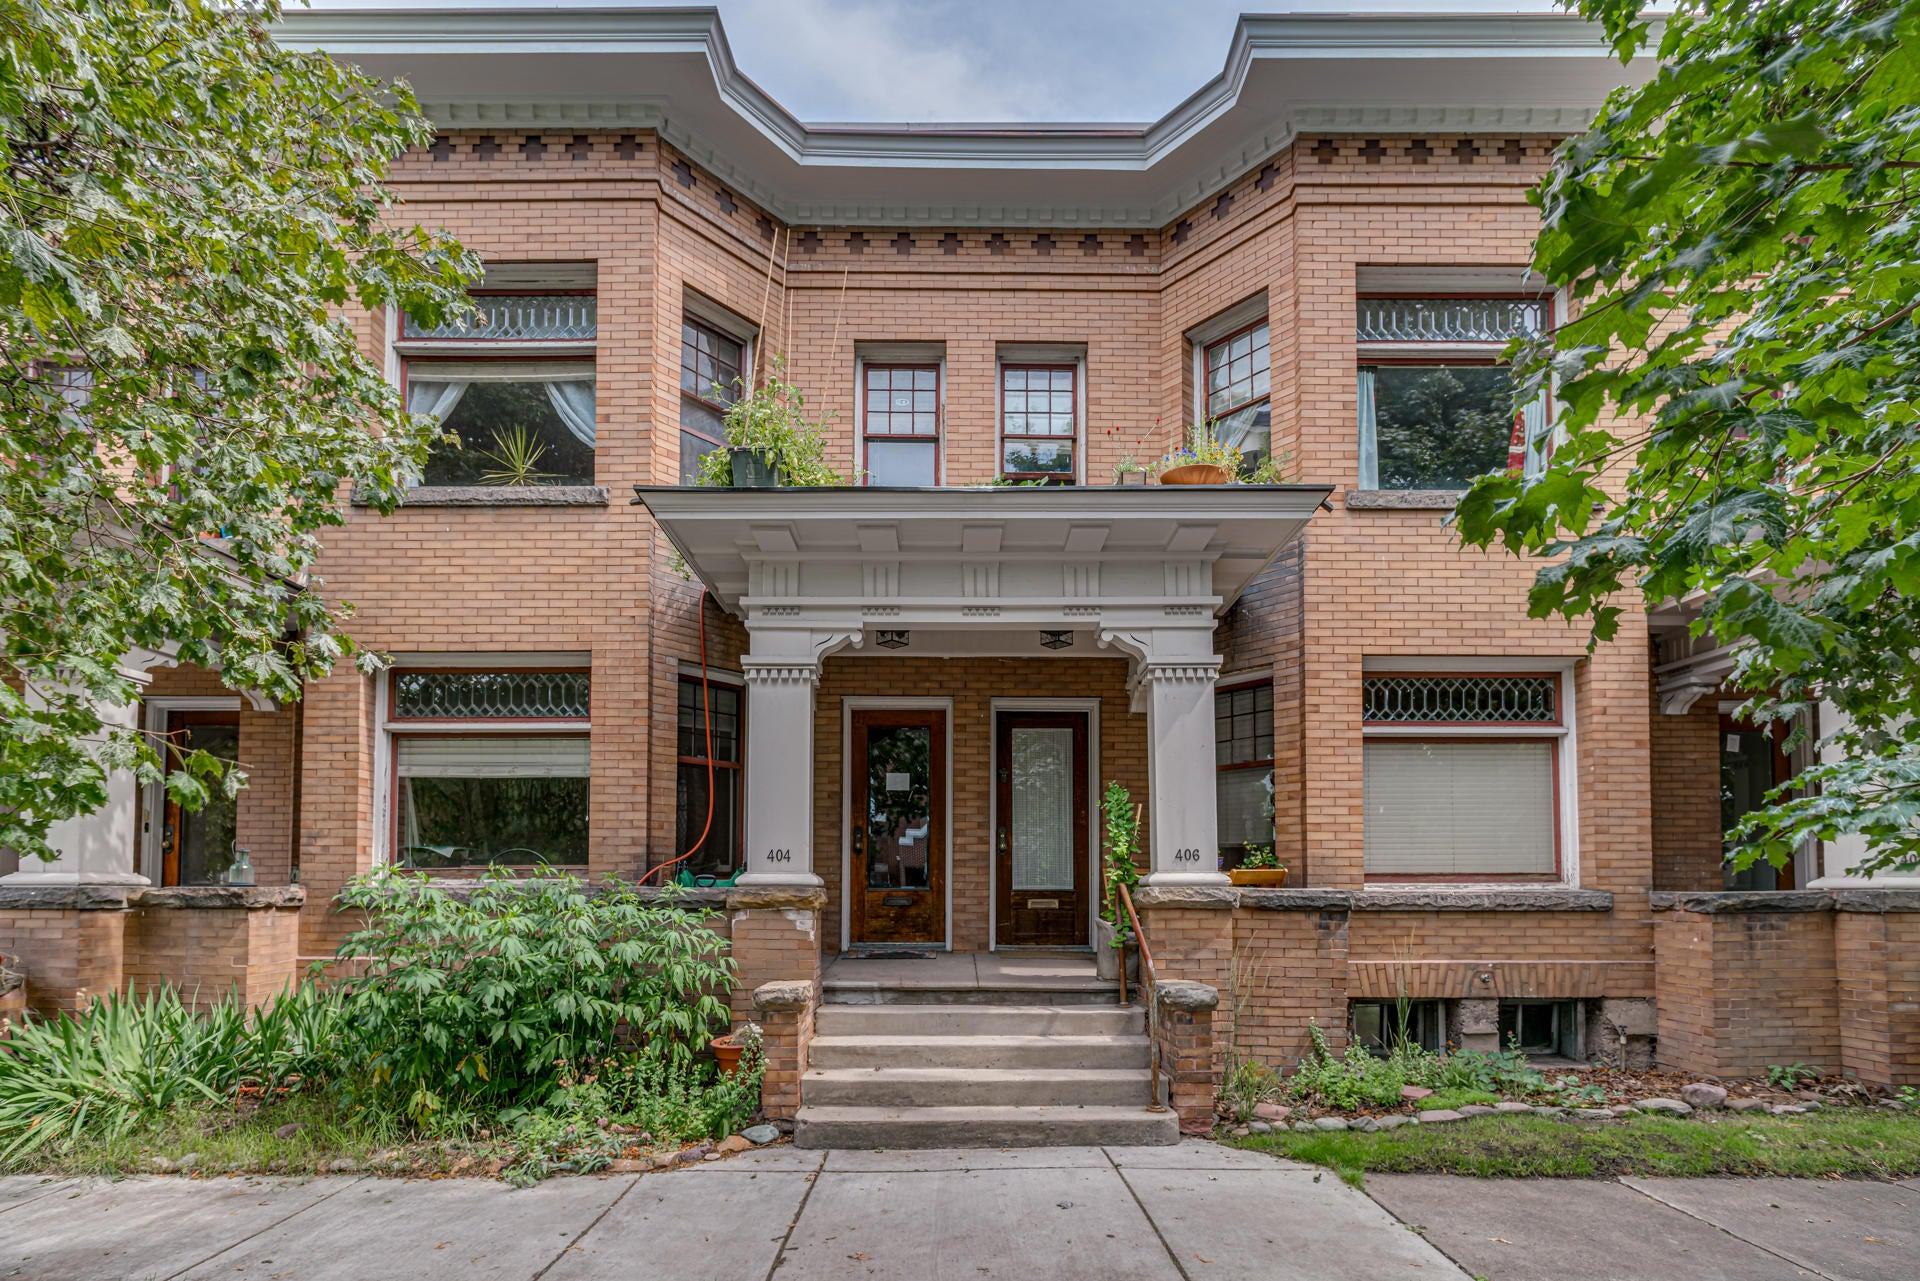 400 Roosevelt Street, Unit 404, Missoula, MT 59801